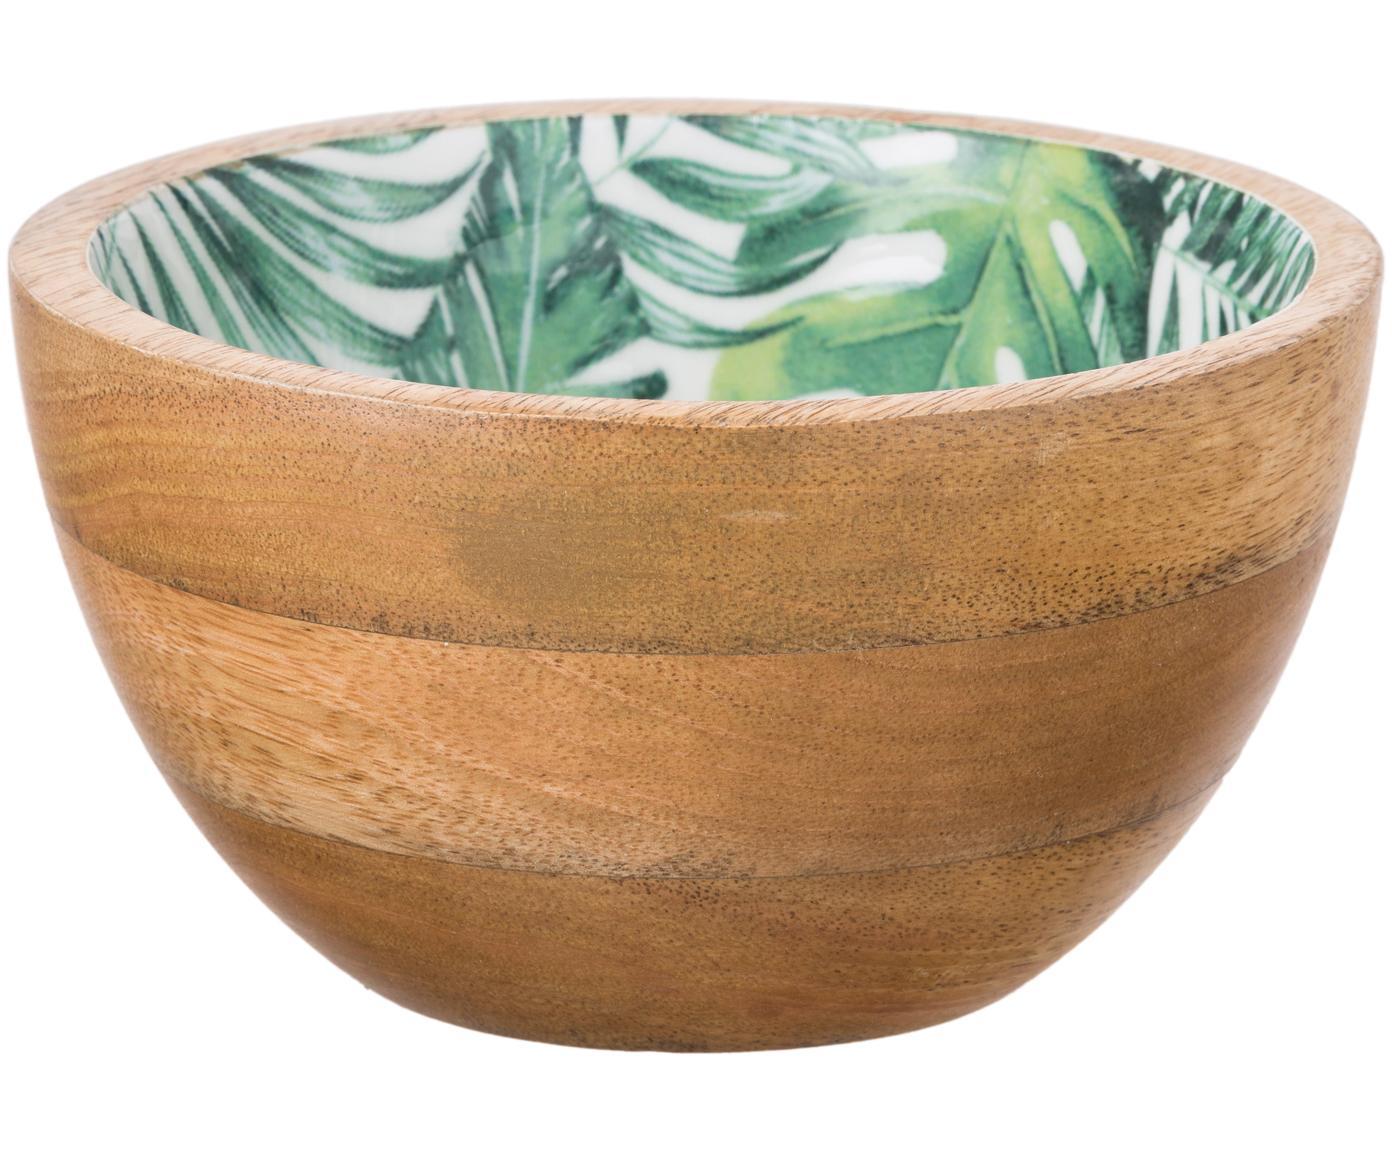 Cuenco de madera de mango Alina, Madera de mango, Madera de mango, verde, blanco, Ø 16 x Al 9 cm